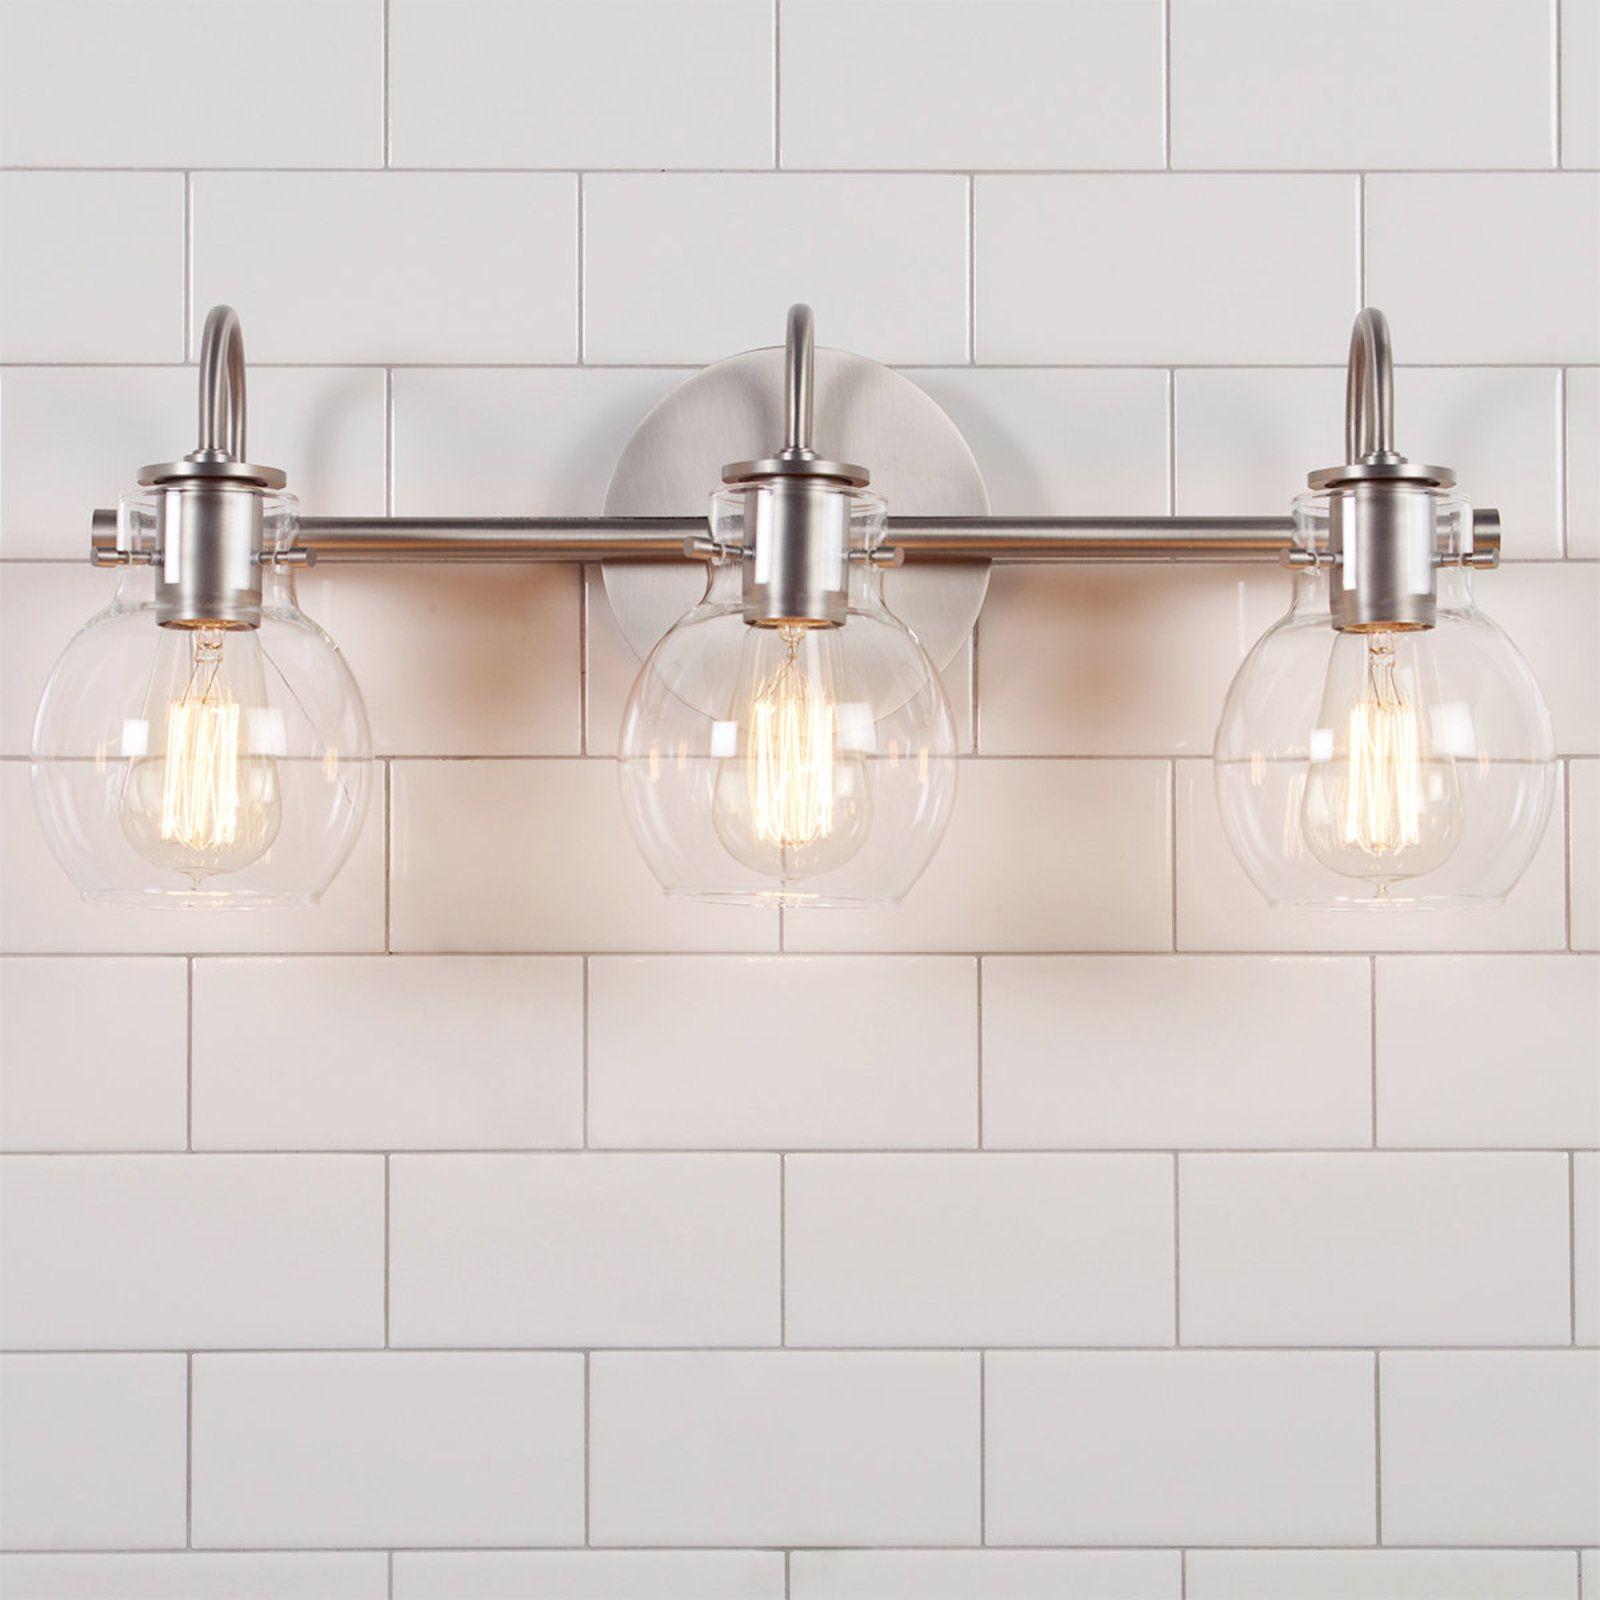 Vintage Arc Shade Bath Light 3 Light Atx Guest Bath Pinterest